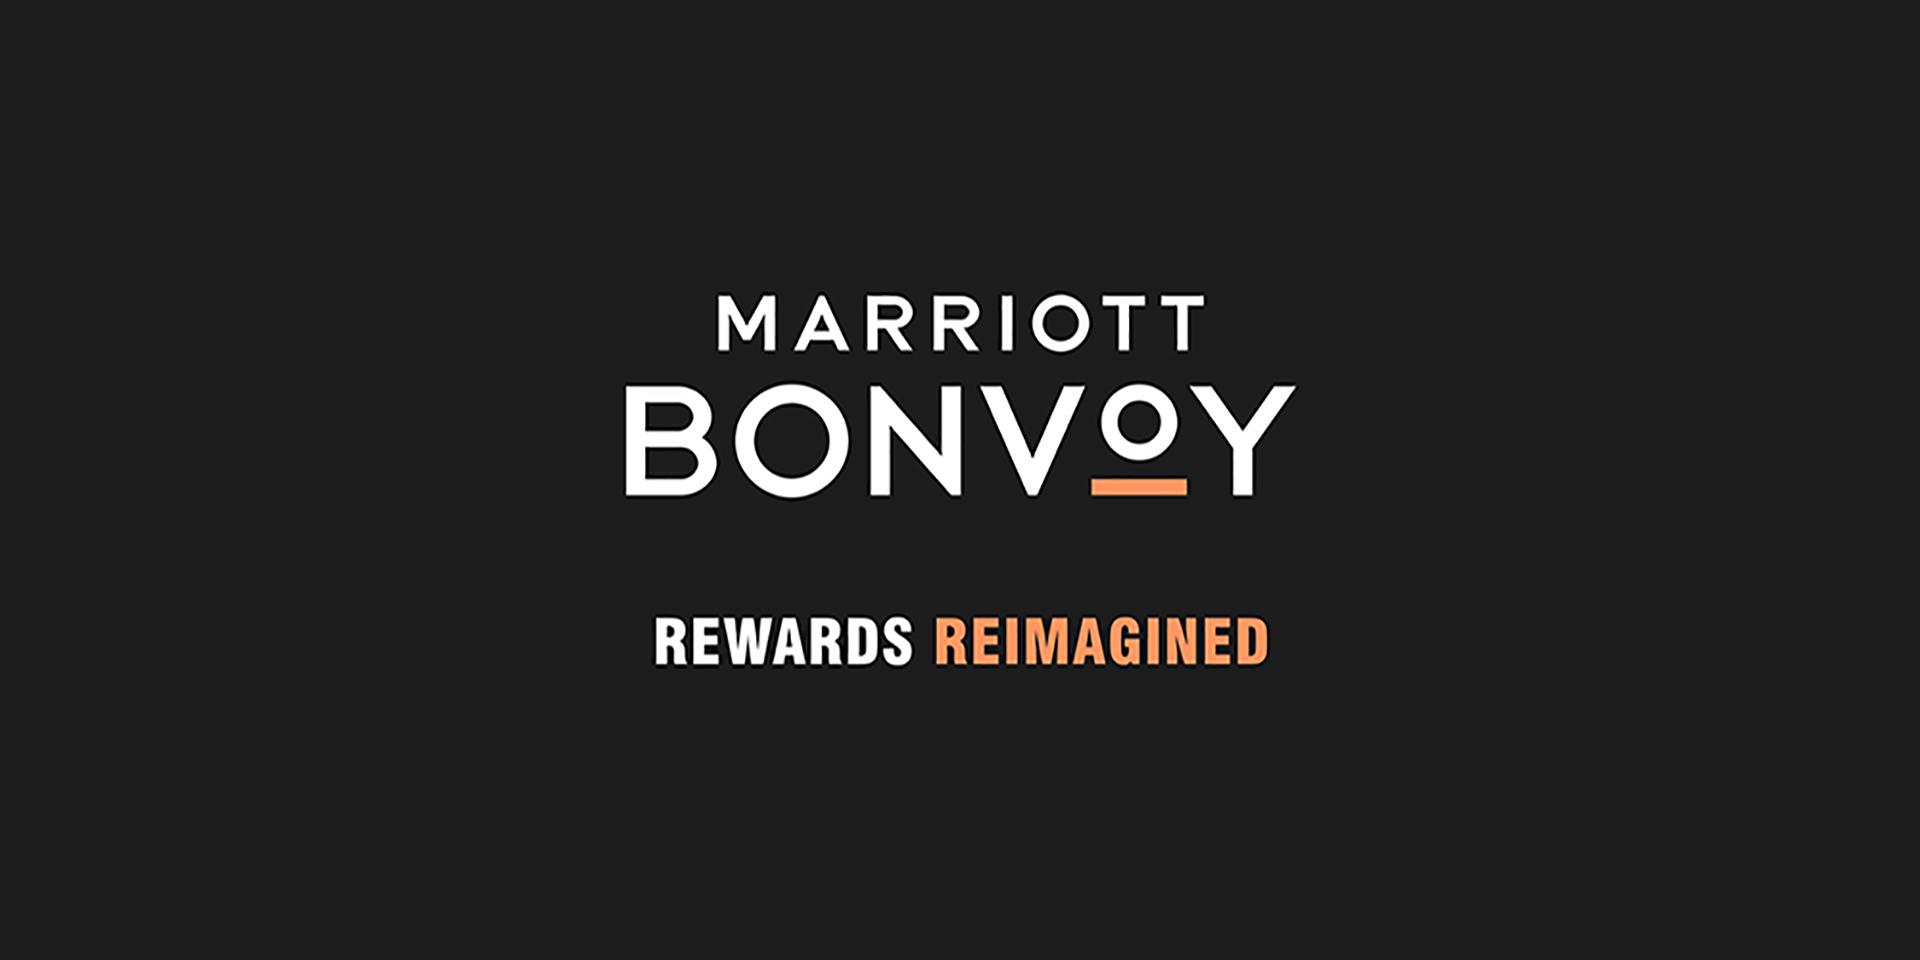 Marriott Bonvoy Kicks Off Global Marketing Campaign to